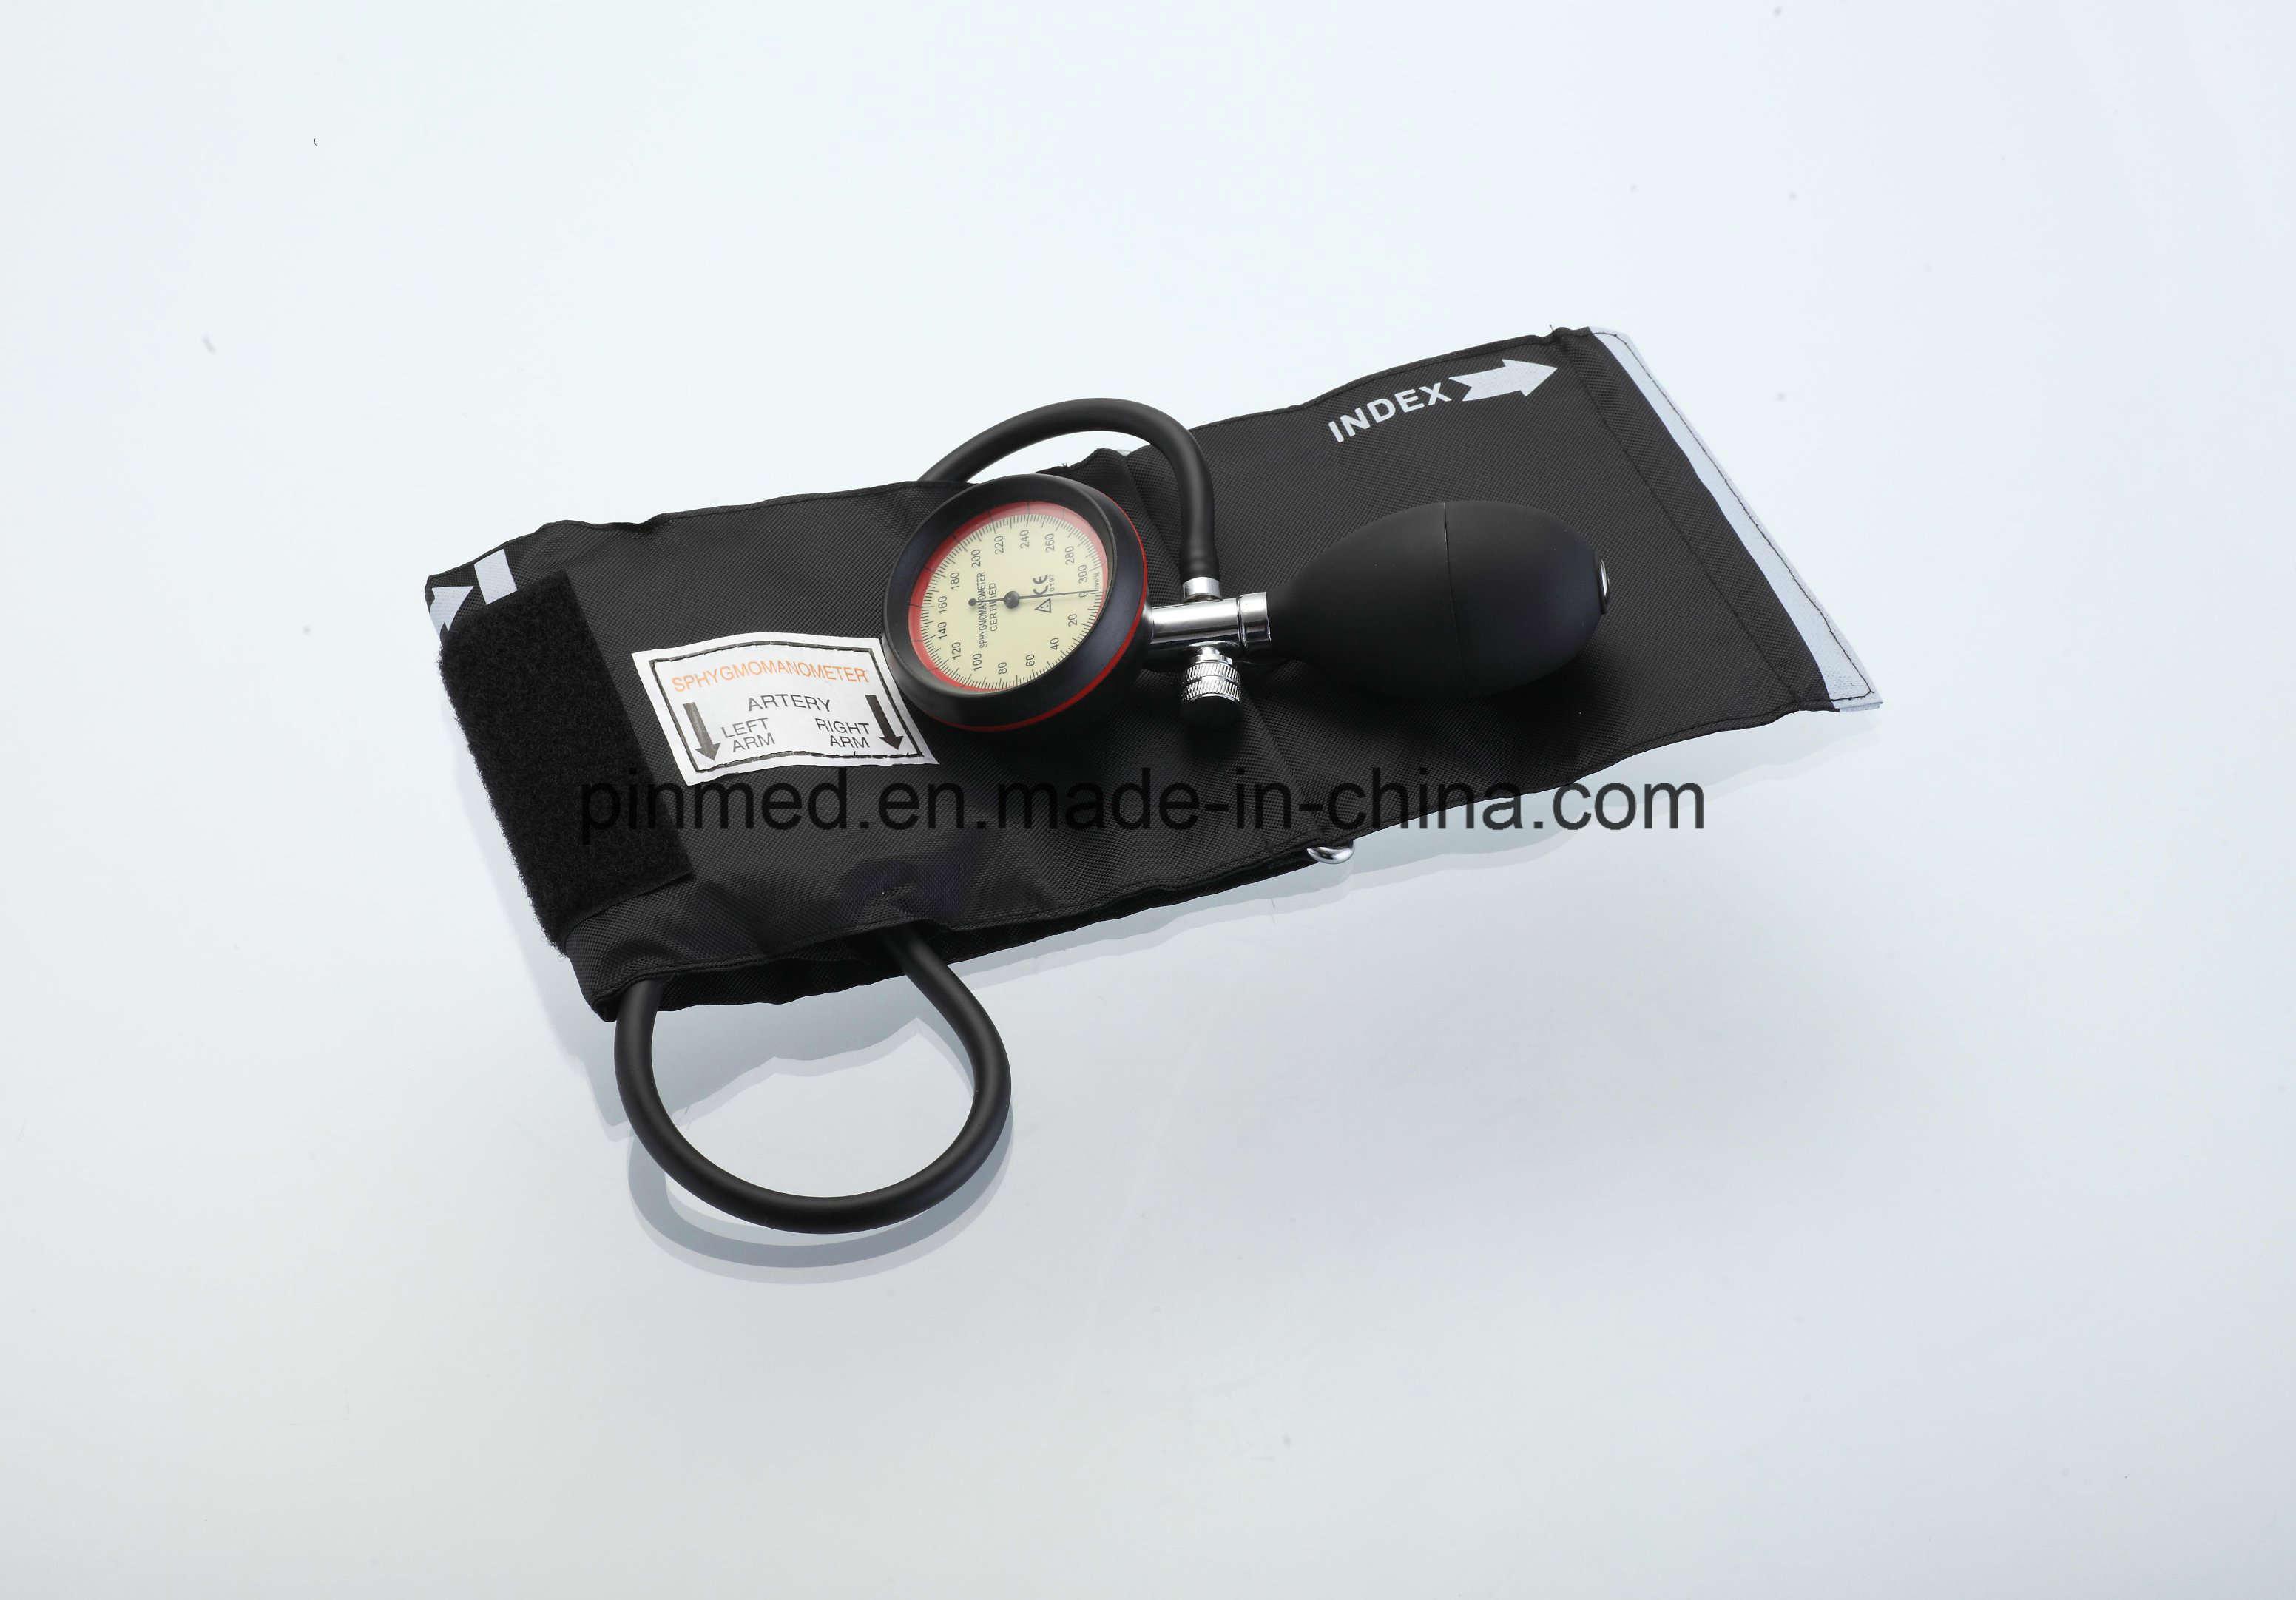 Palm Type Sphygmomanometer